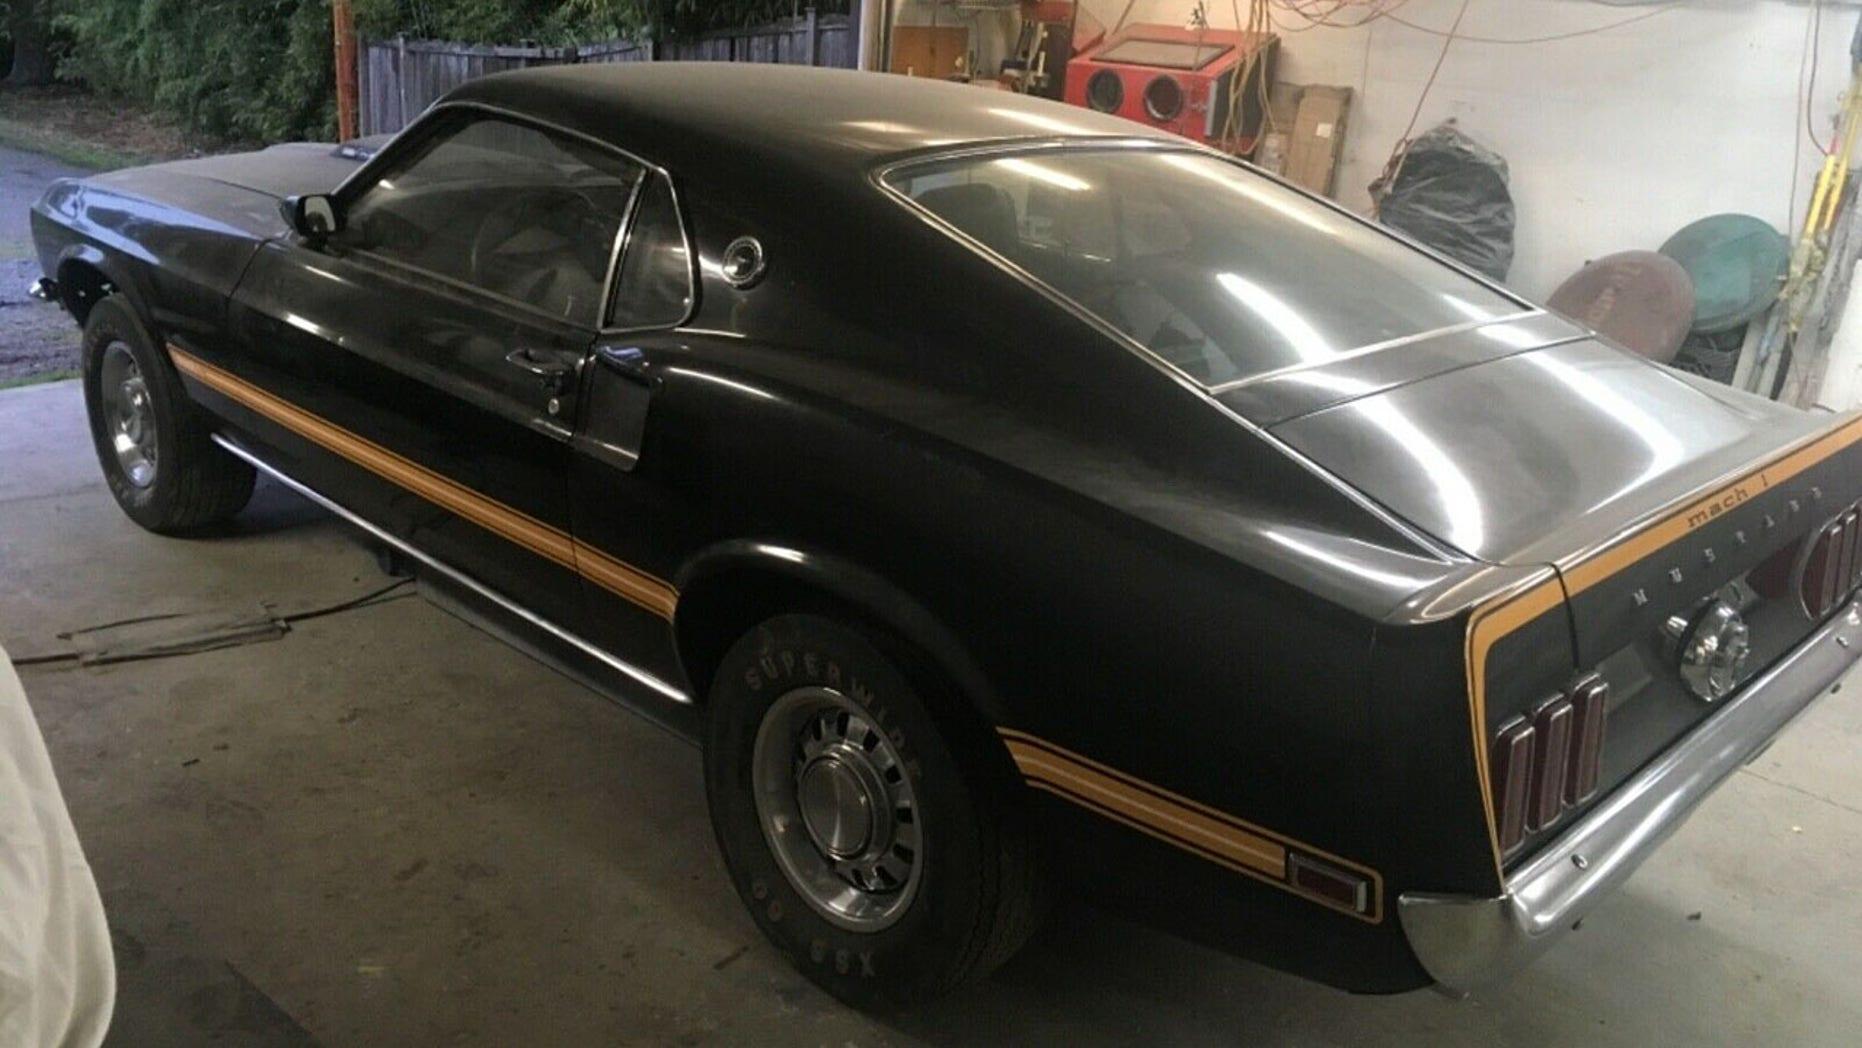 1969 Ford Mustang Mach 1 Cobra Jet